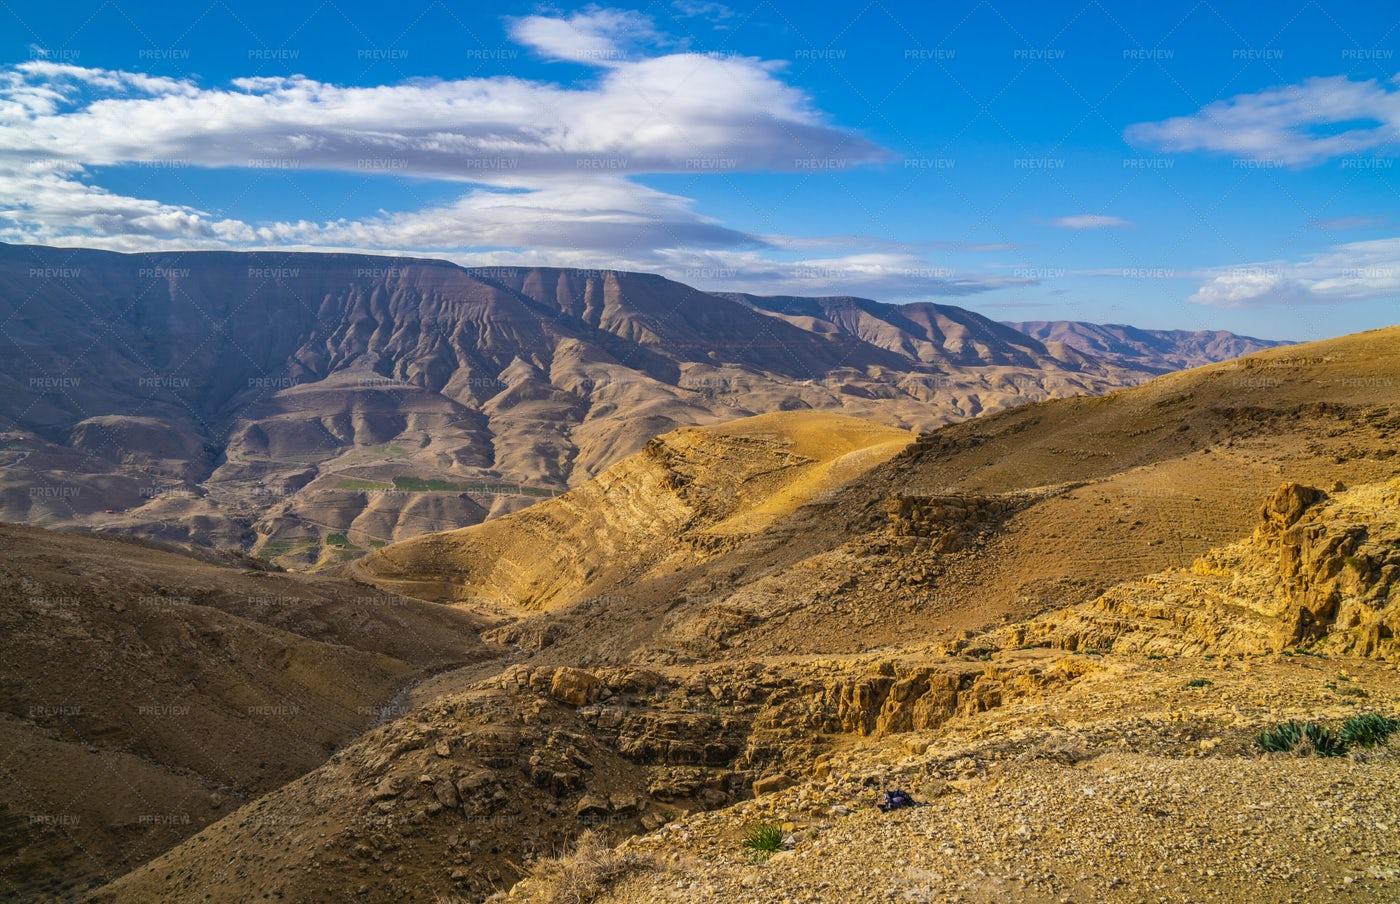 Wadi Mujib Canyon And Desert: Stock Photos